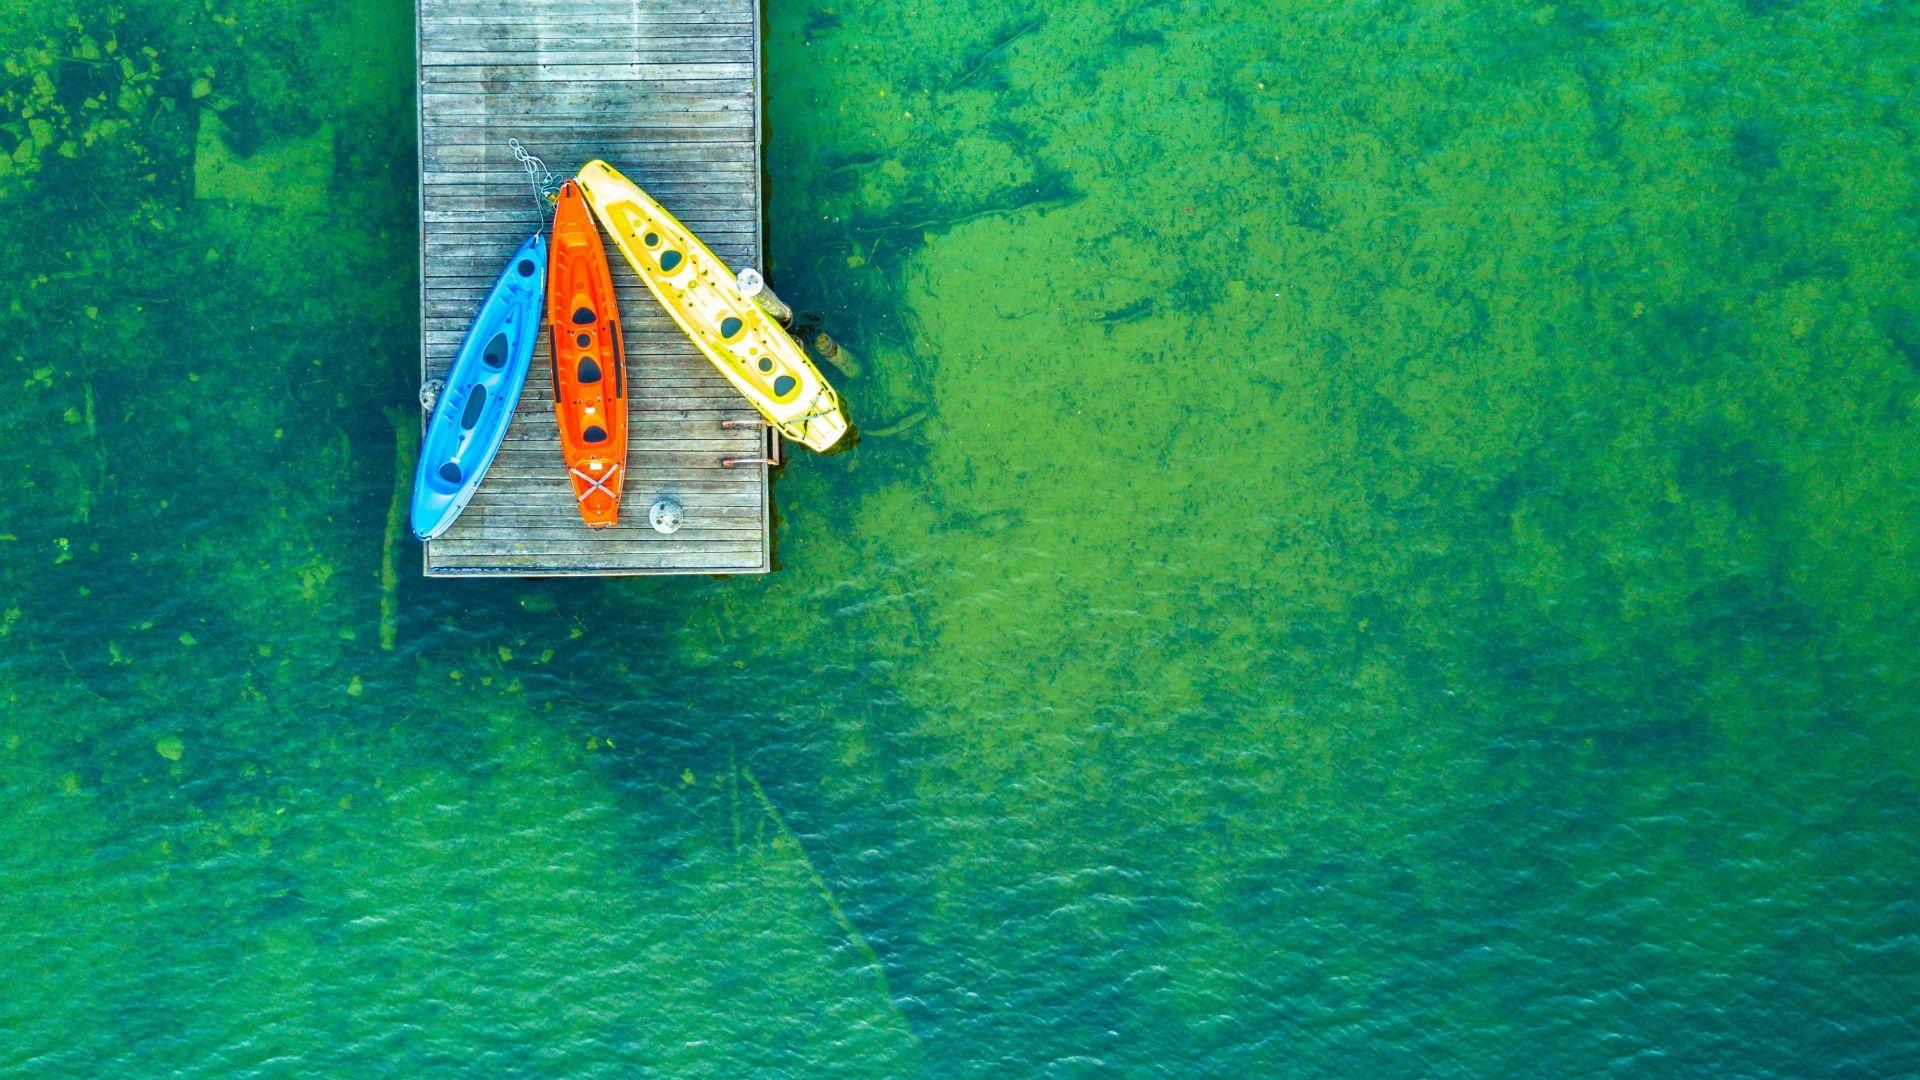 Hd Superhero Wallpapers For Pc Desktop Wallpaper Green Lake Boats Aerial View Holiday